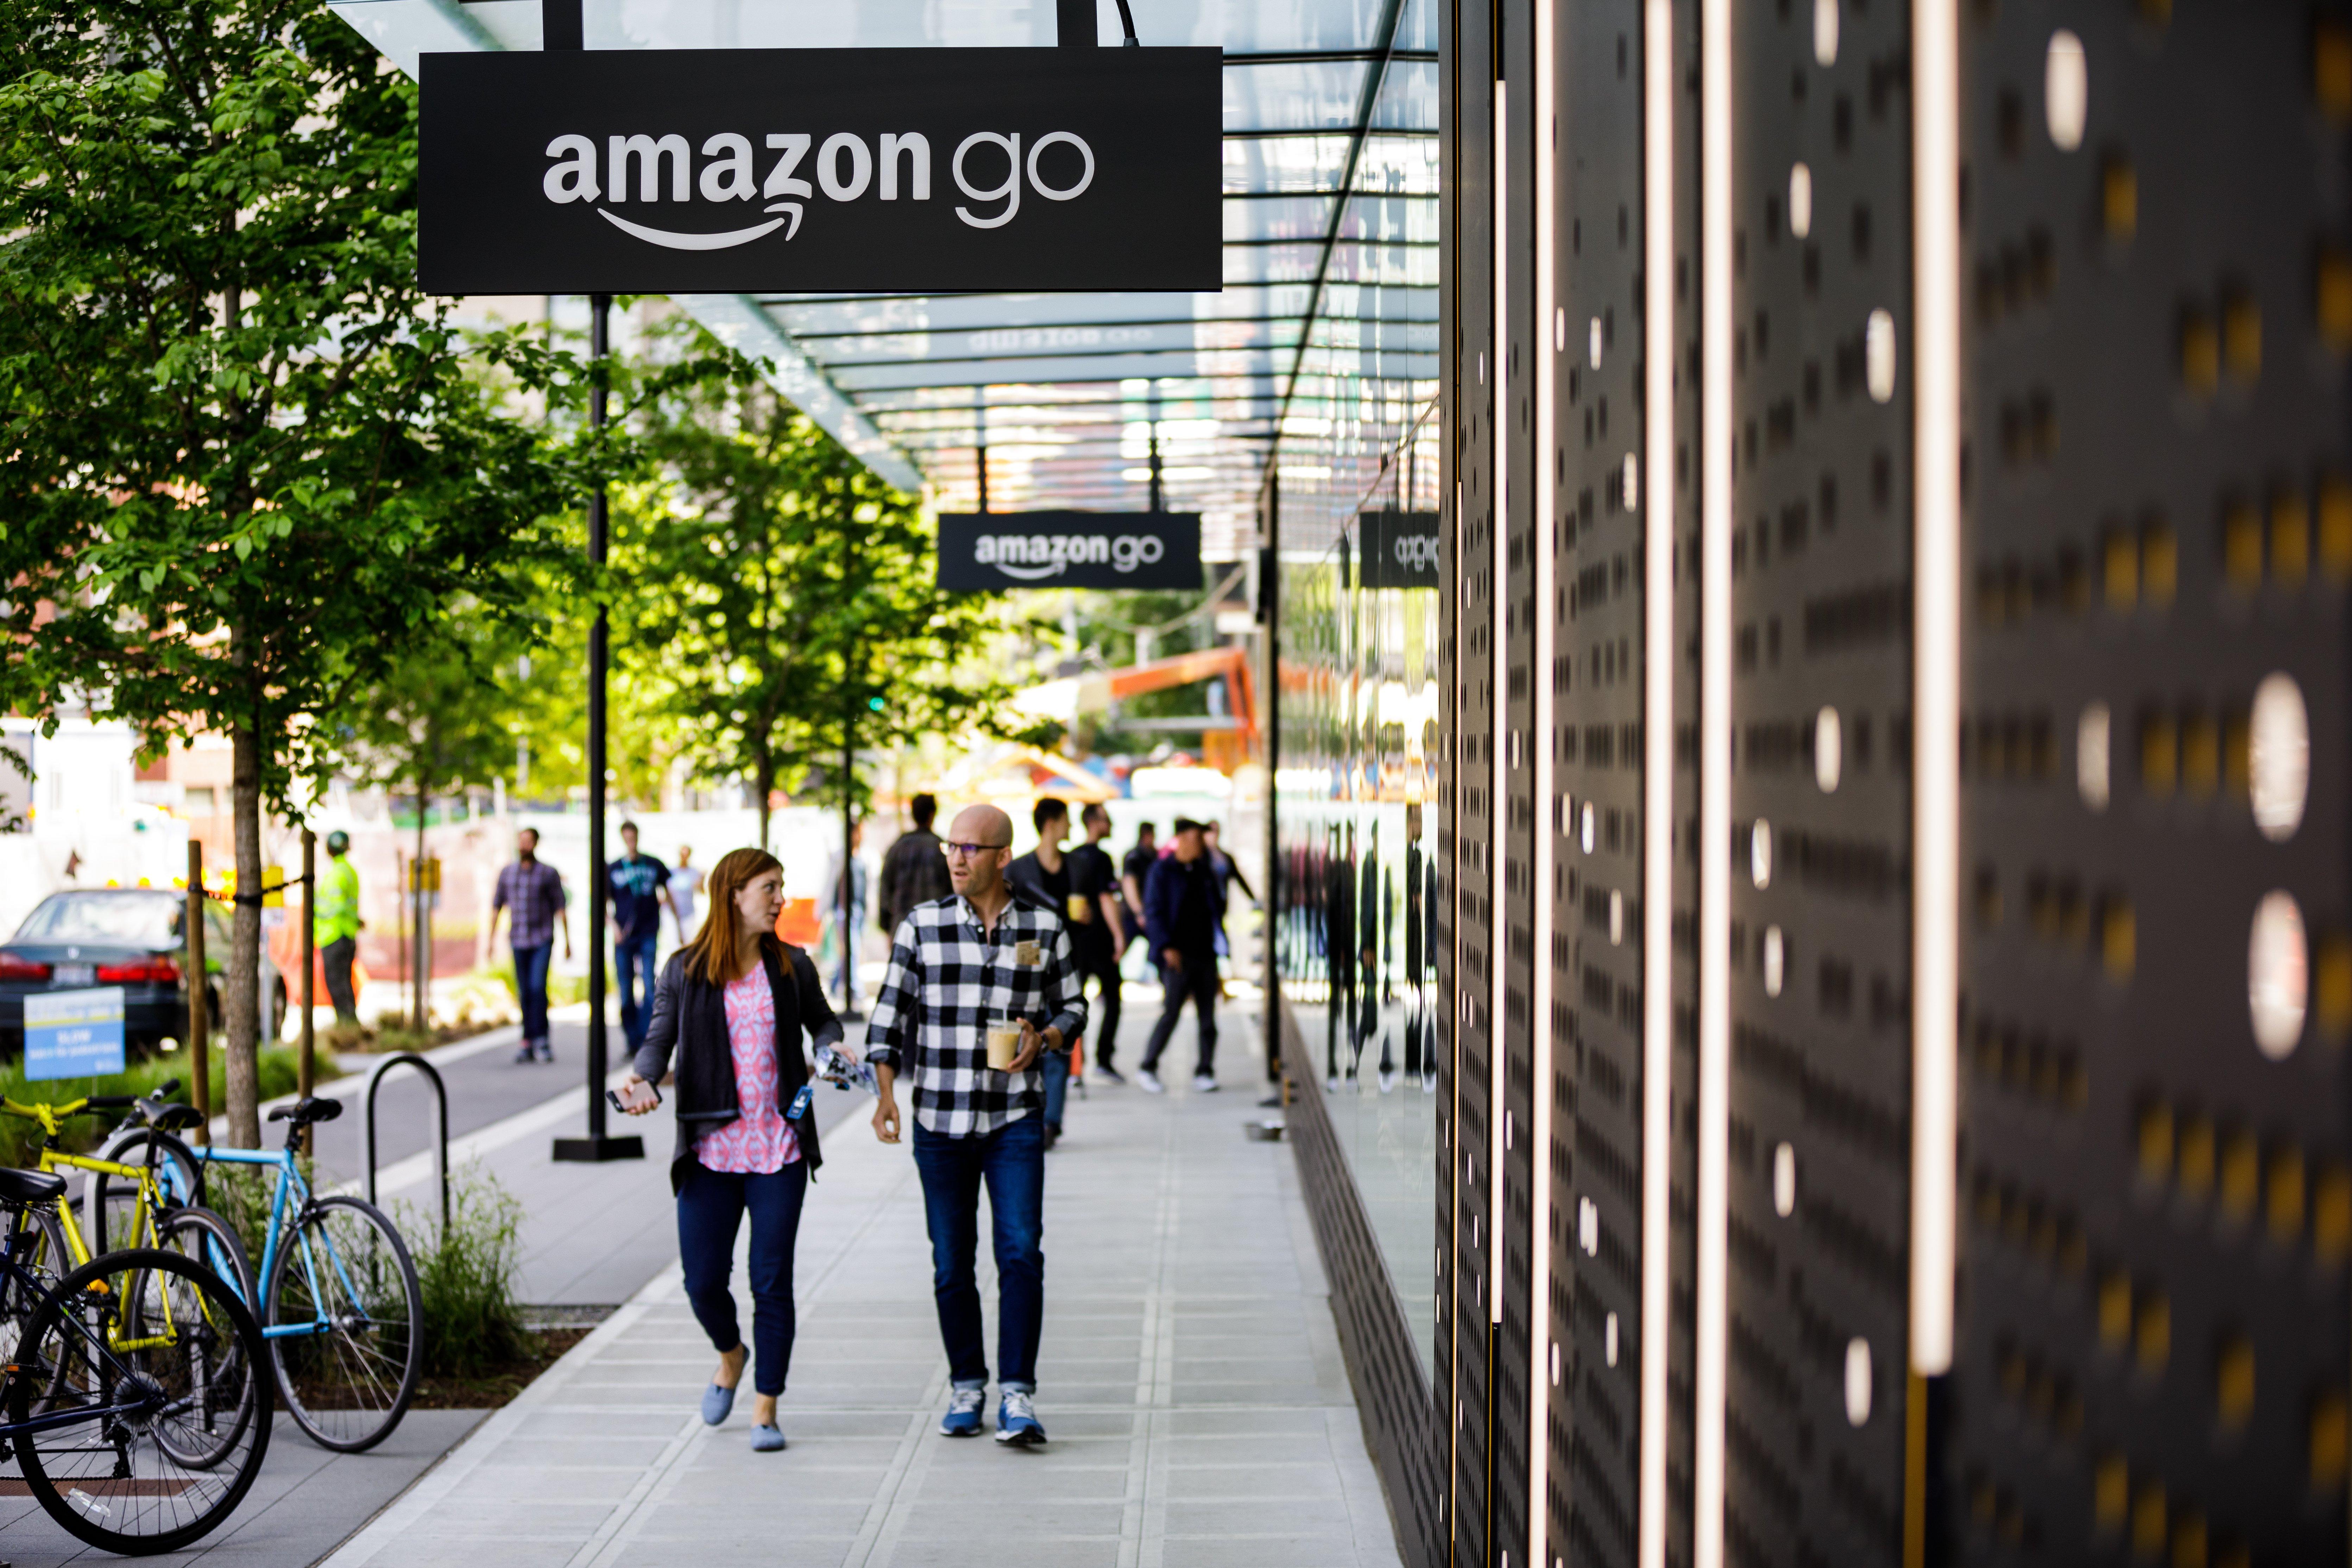 Couple walking past Amazon Go store